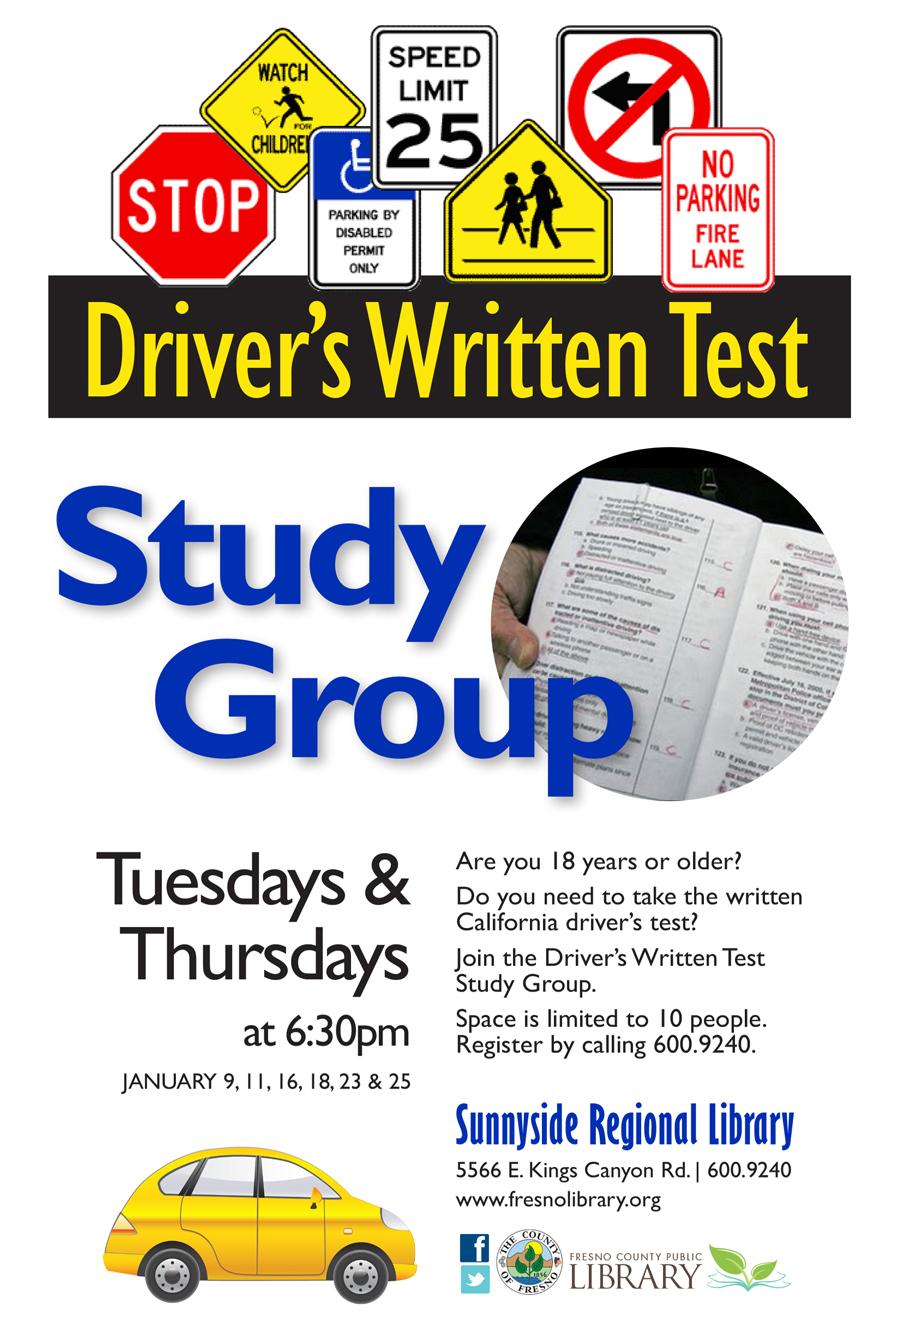 Driver's Written Test Study Group